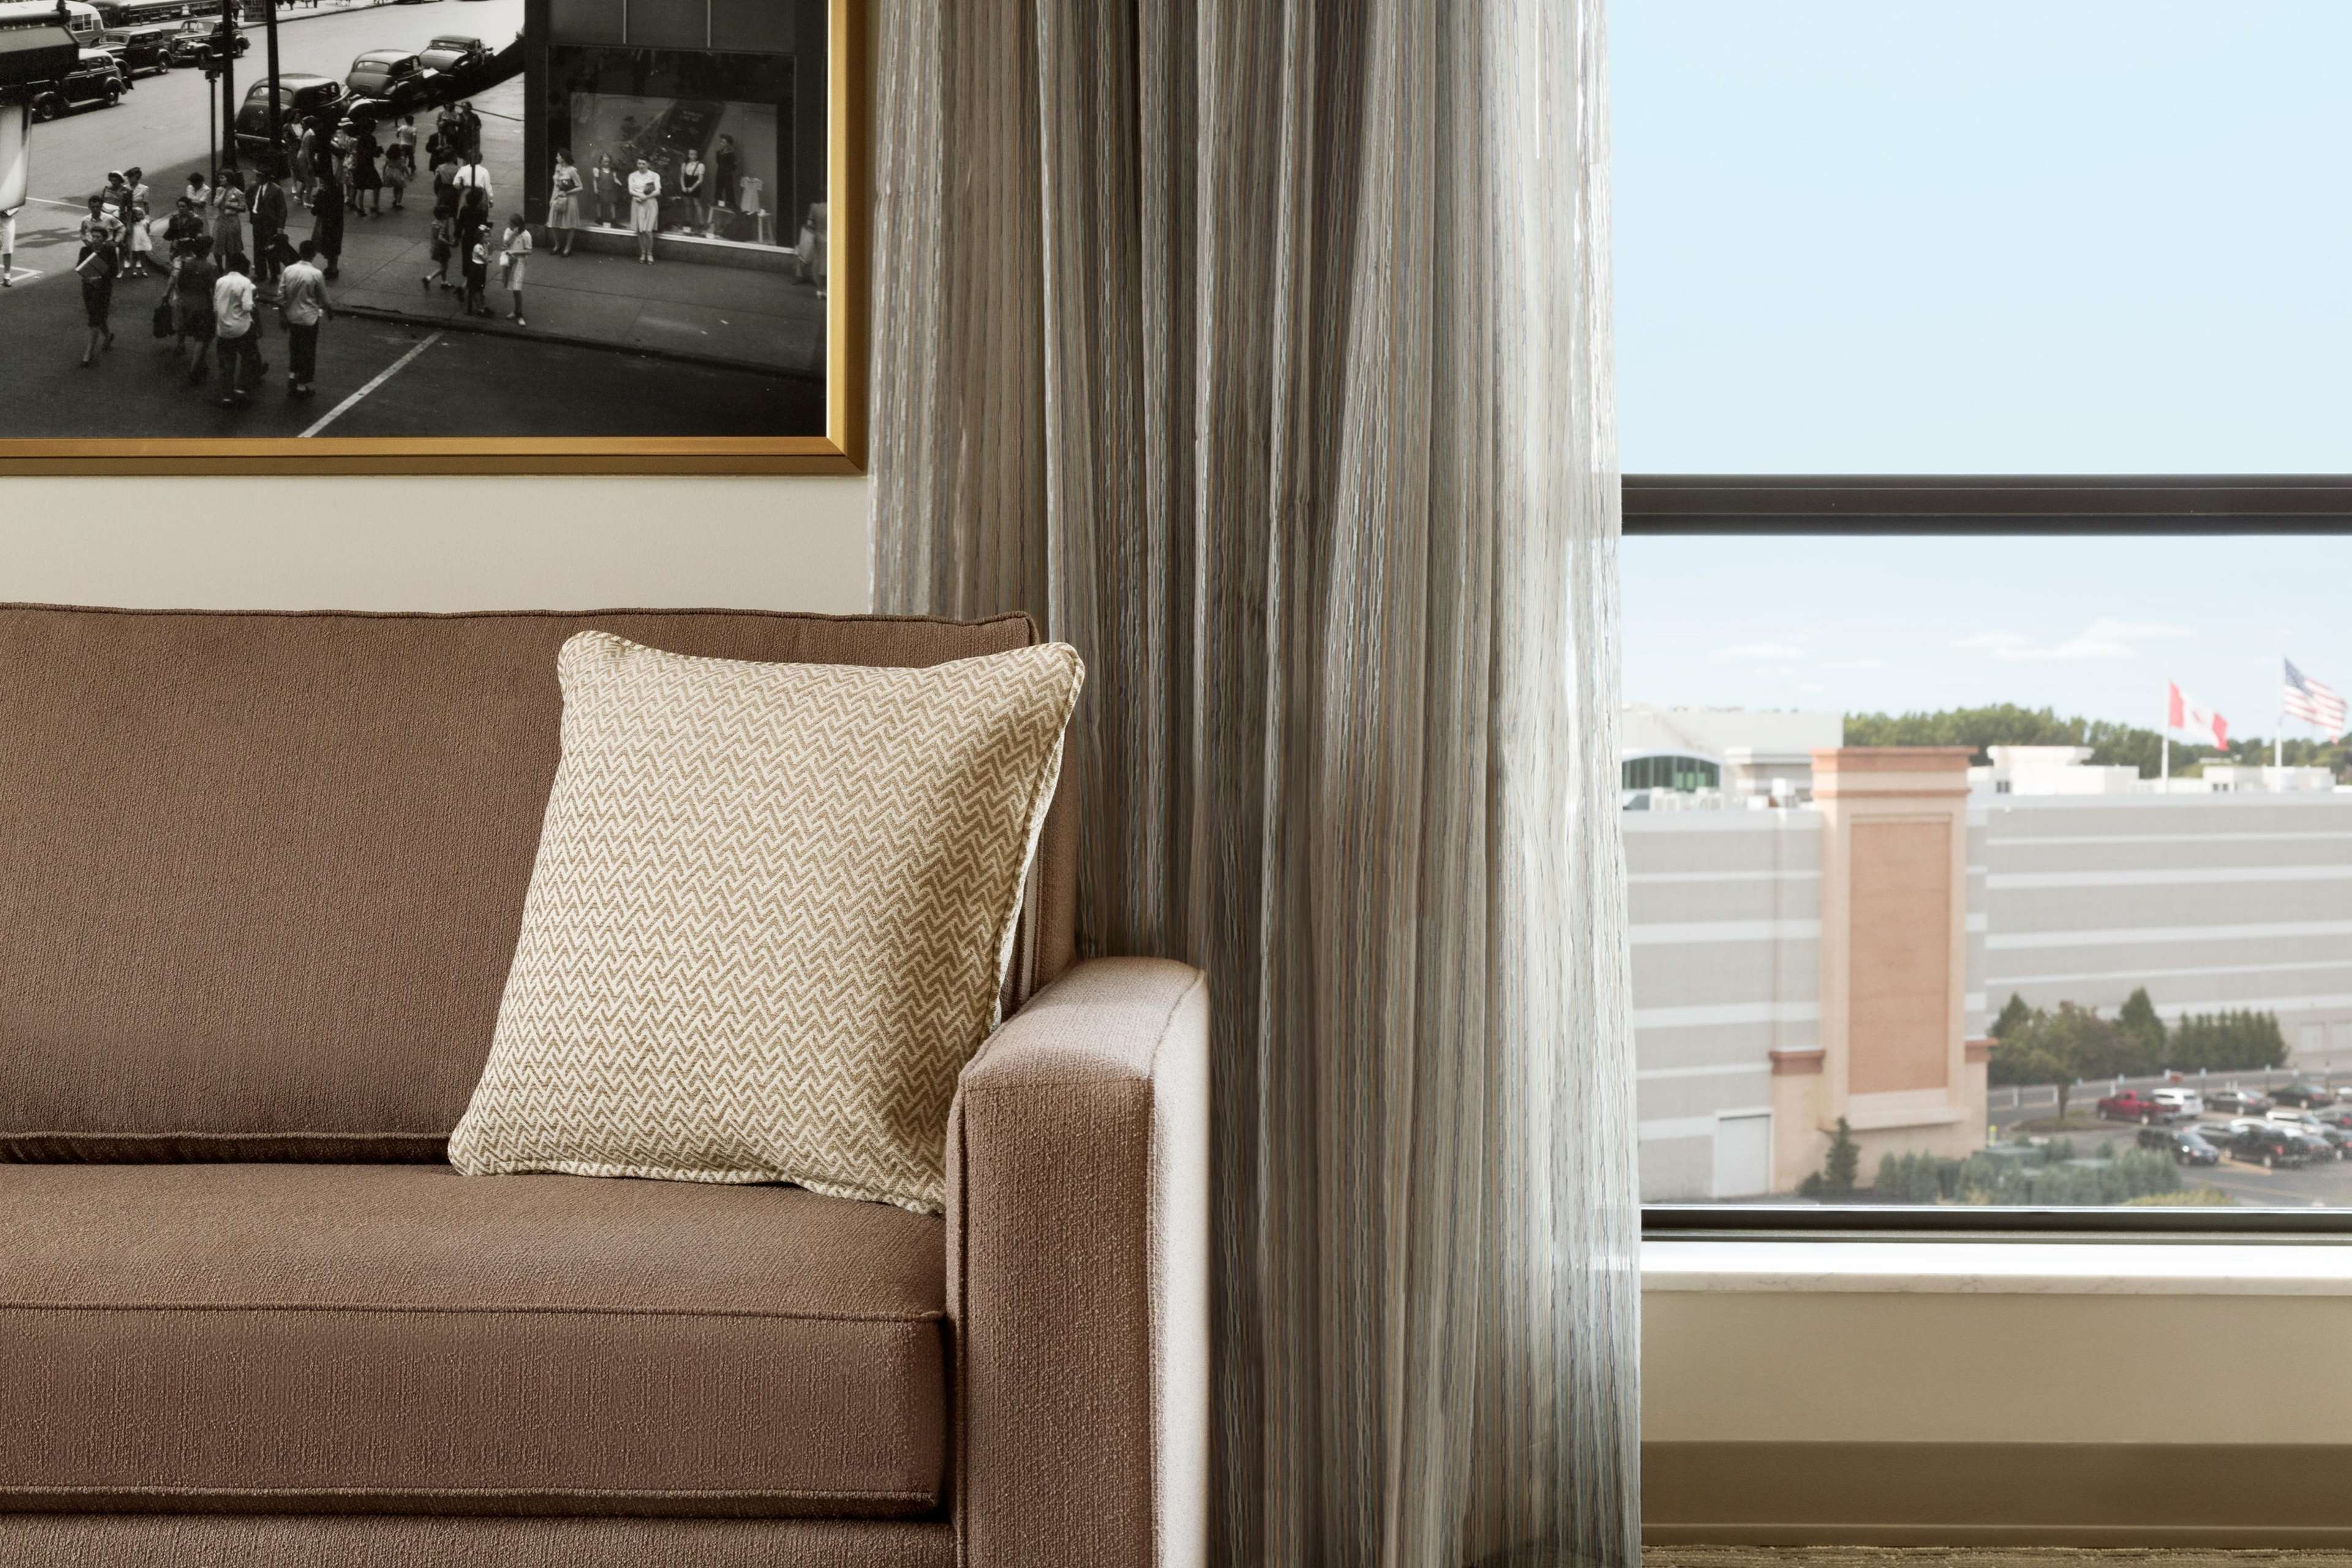 Embassy Suites by Hilton Syracuse Destiny USA image 6